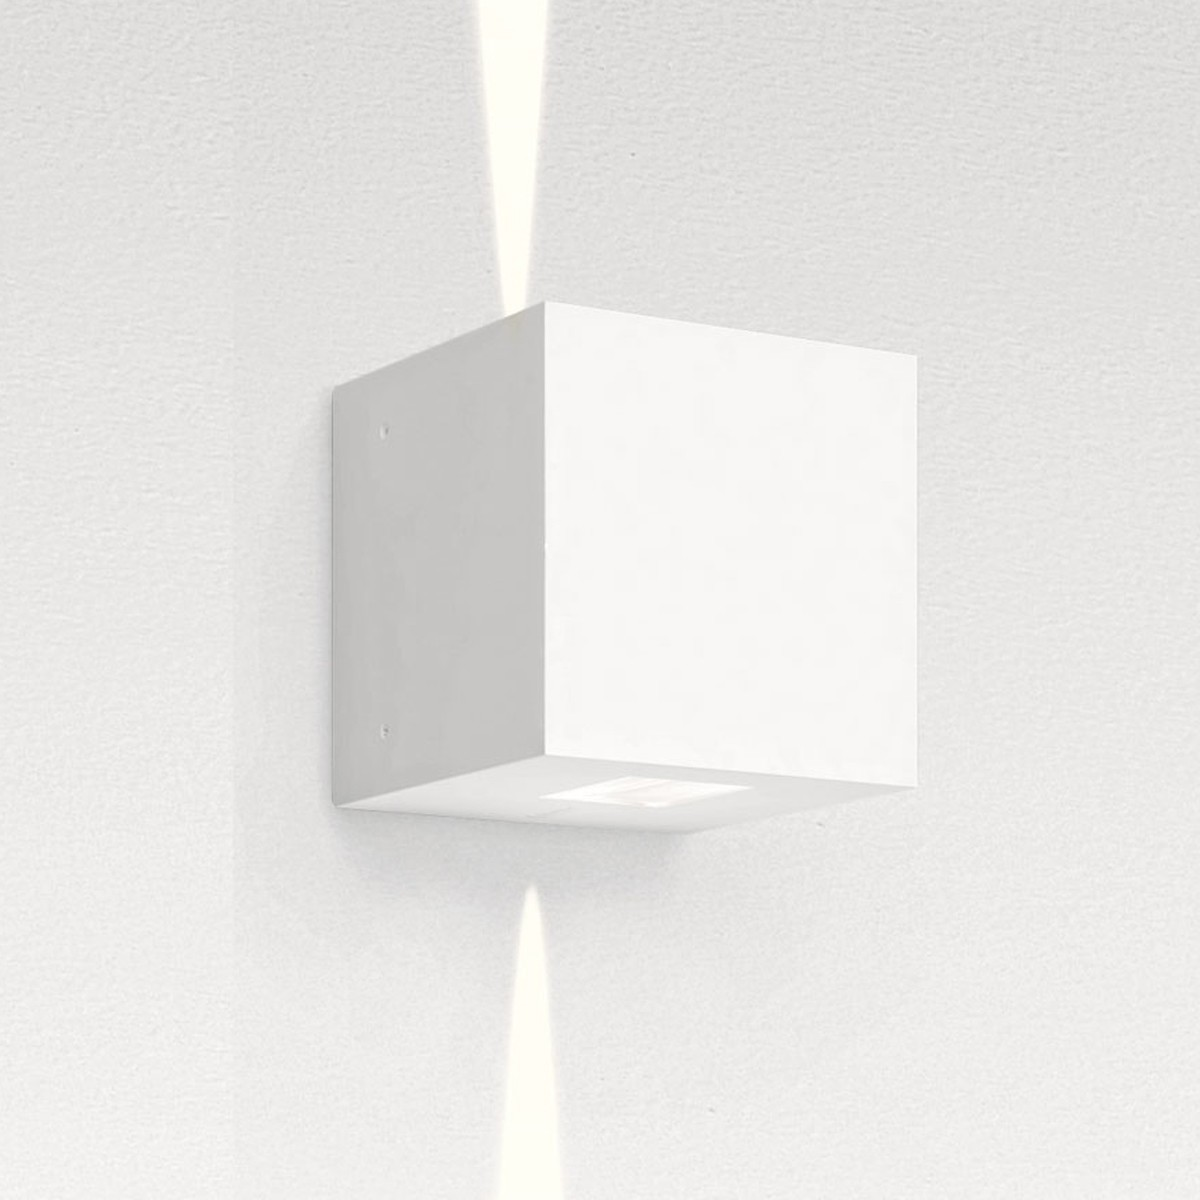 Artemide Outdoor Effetto 14S LED 2N Wandleuchte, 2 x 5°, 3000 K, hellgrau